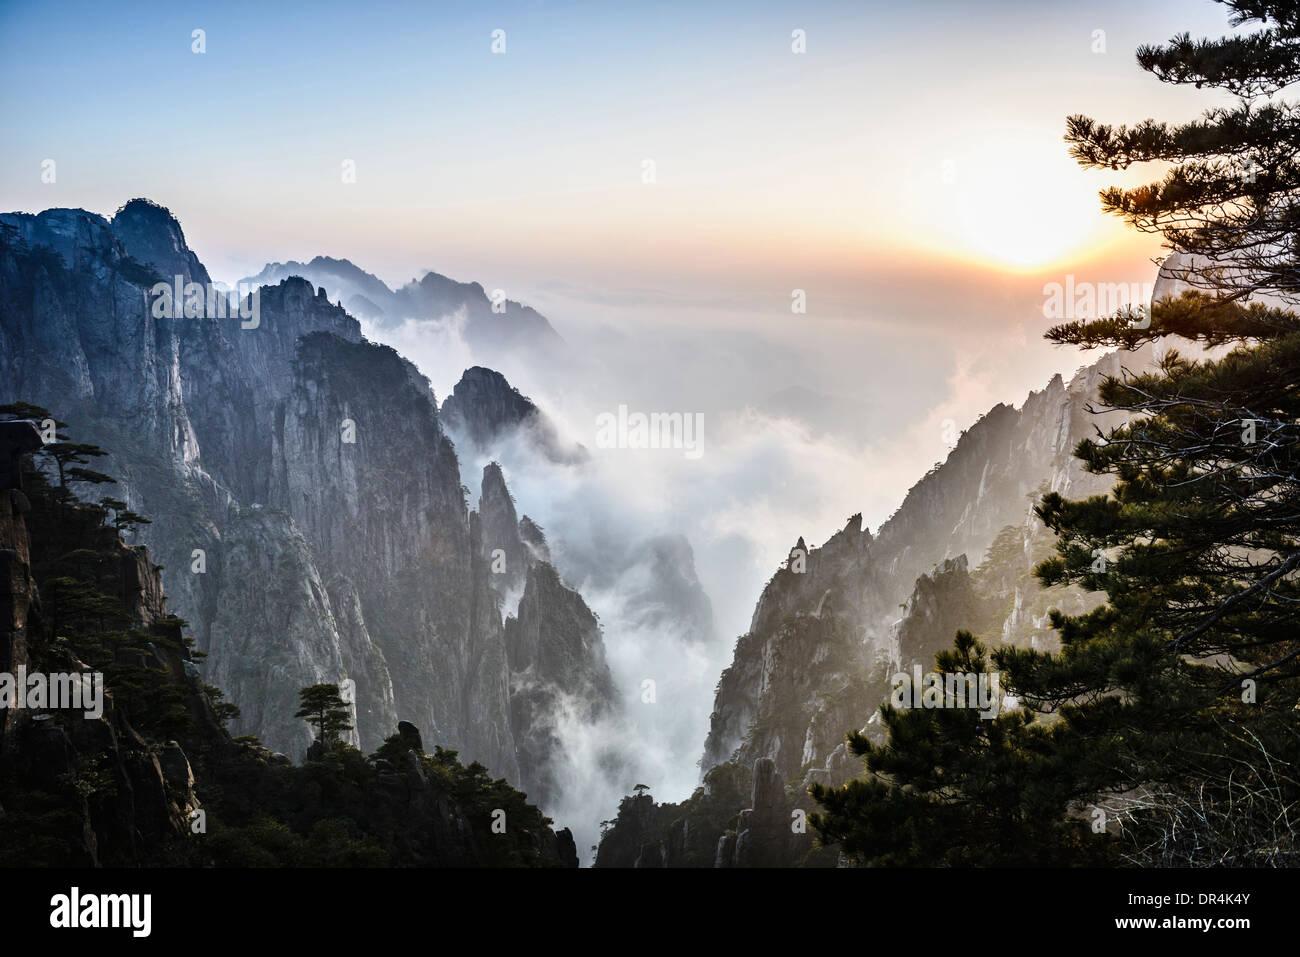 Nebbia laminazione su montagne rocciose, Huangshan Anhui, Cina Immagini Stock